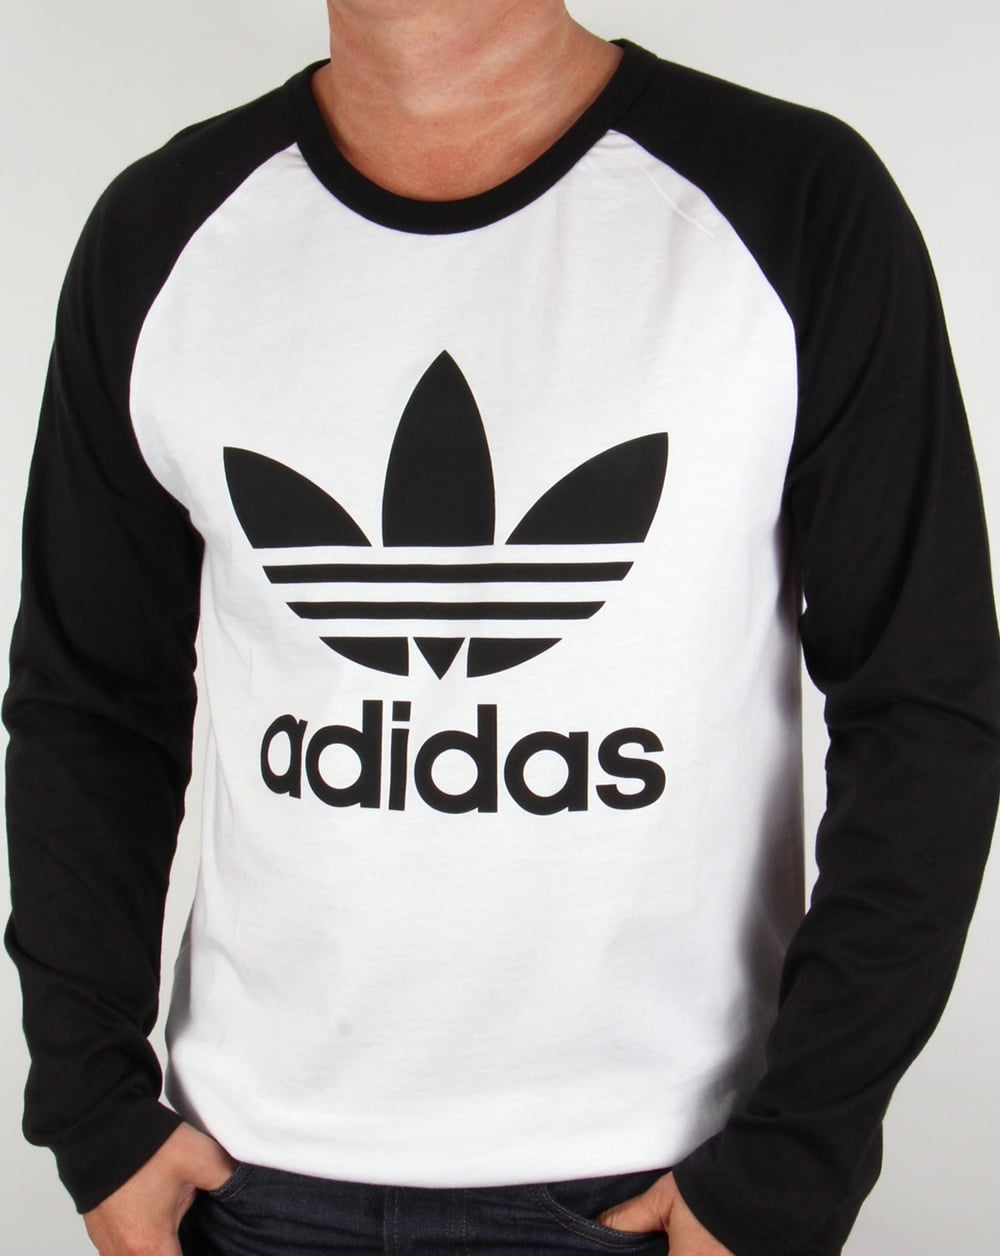 Adidas Originals Trefoil Long Sleeve Raglan T-shirt White ...